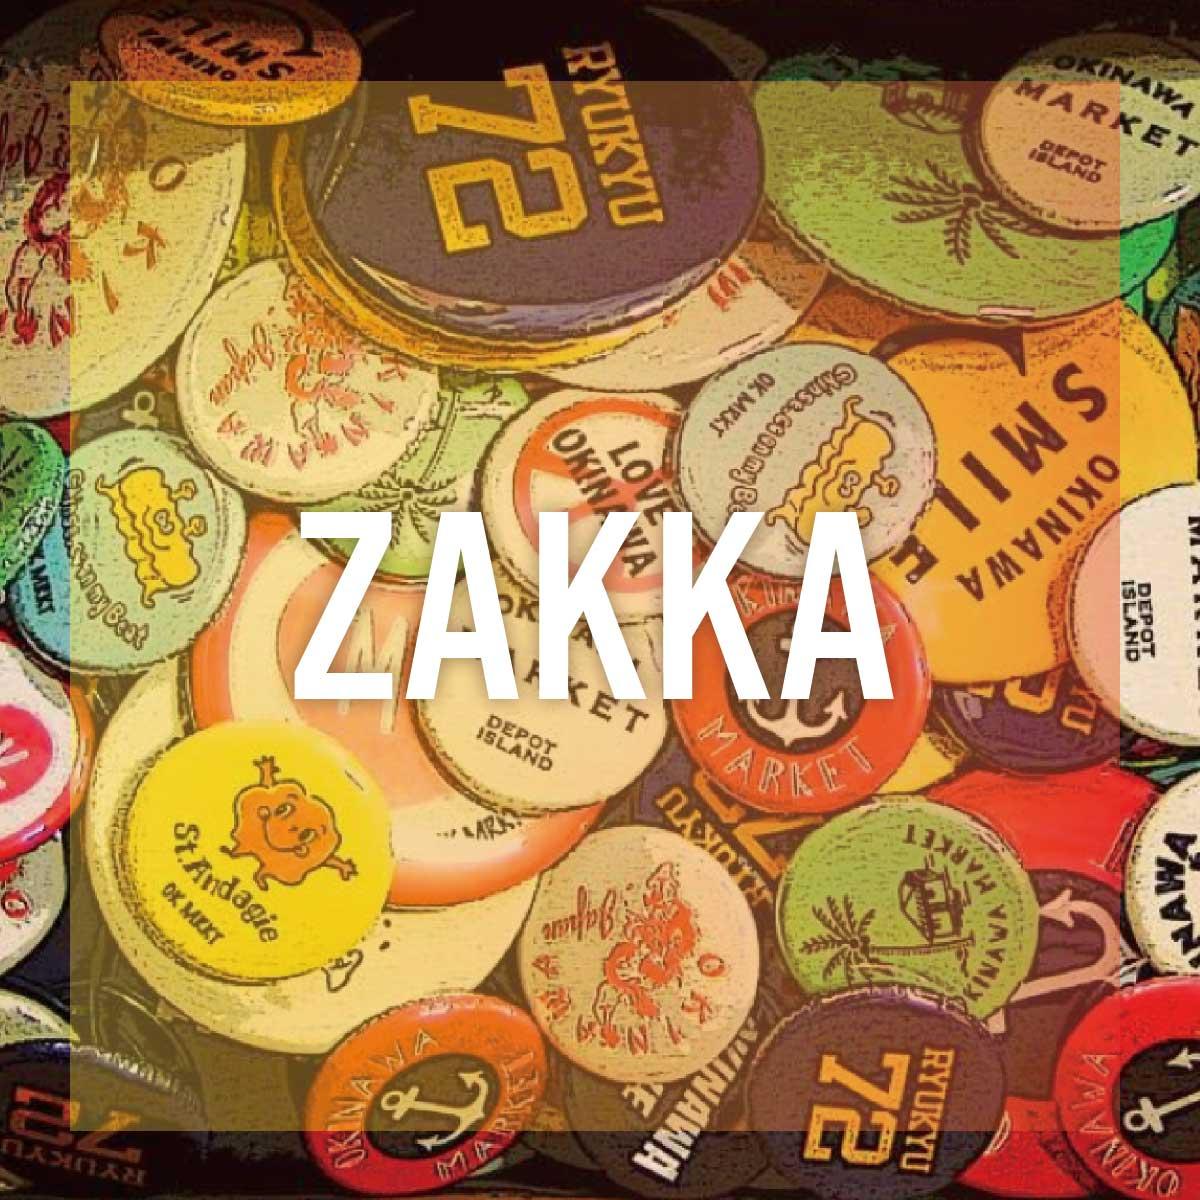 zakka / 雑貨